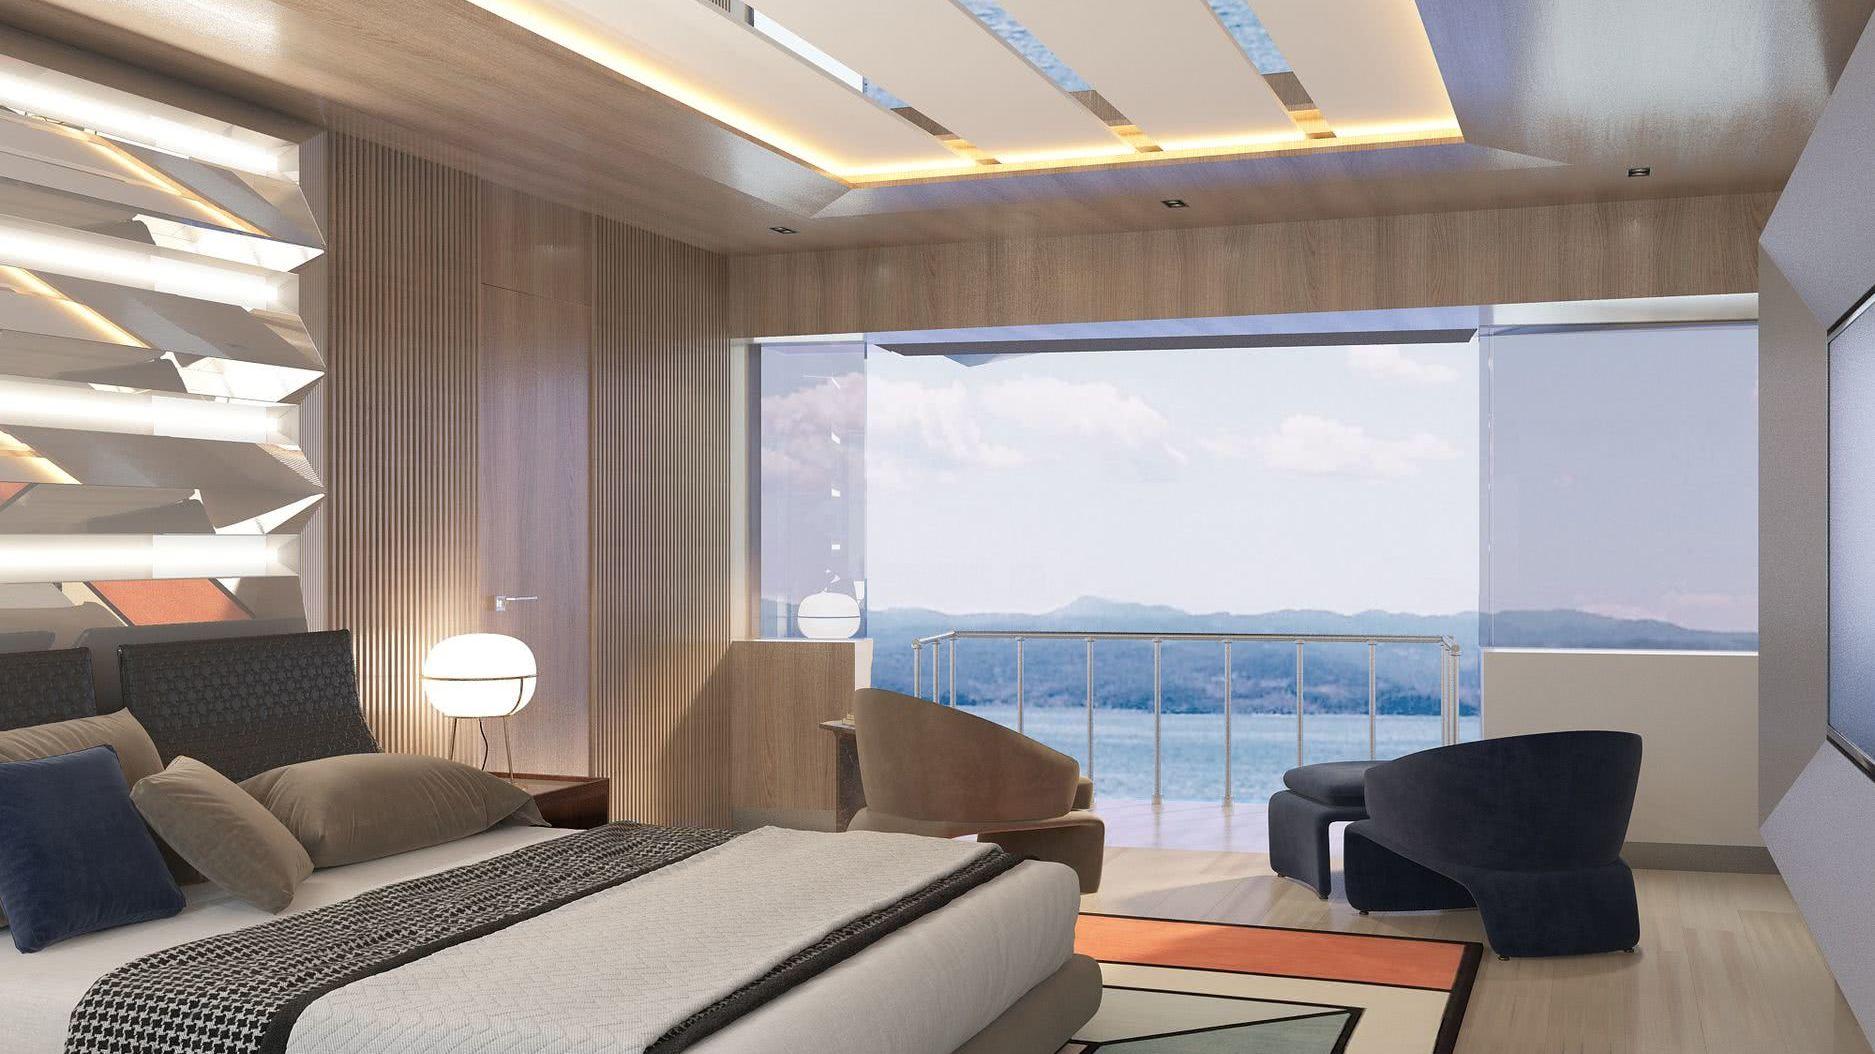 130 Viatorem Explorer Yacht Interior